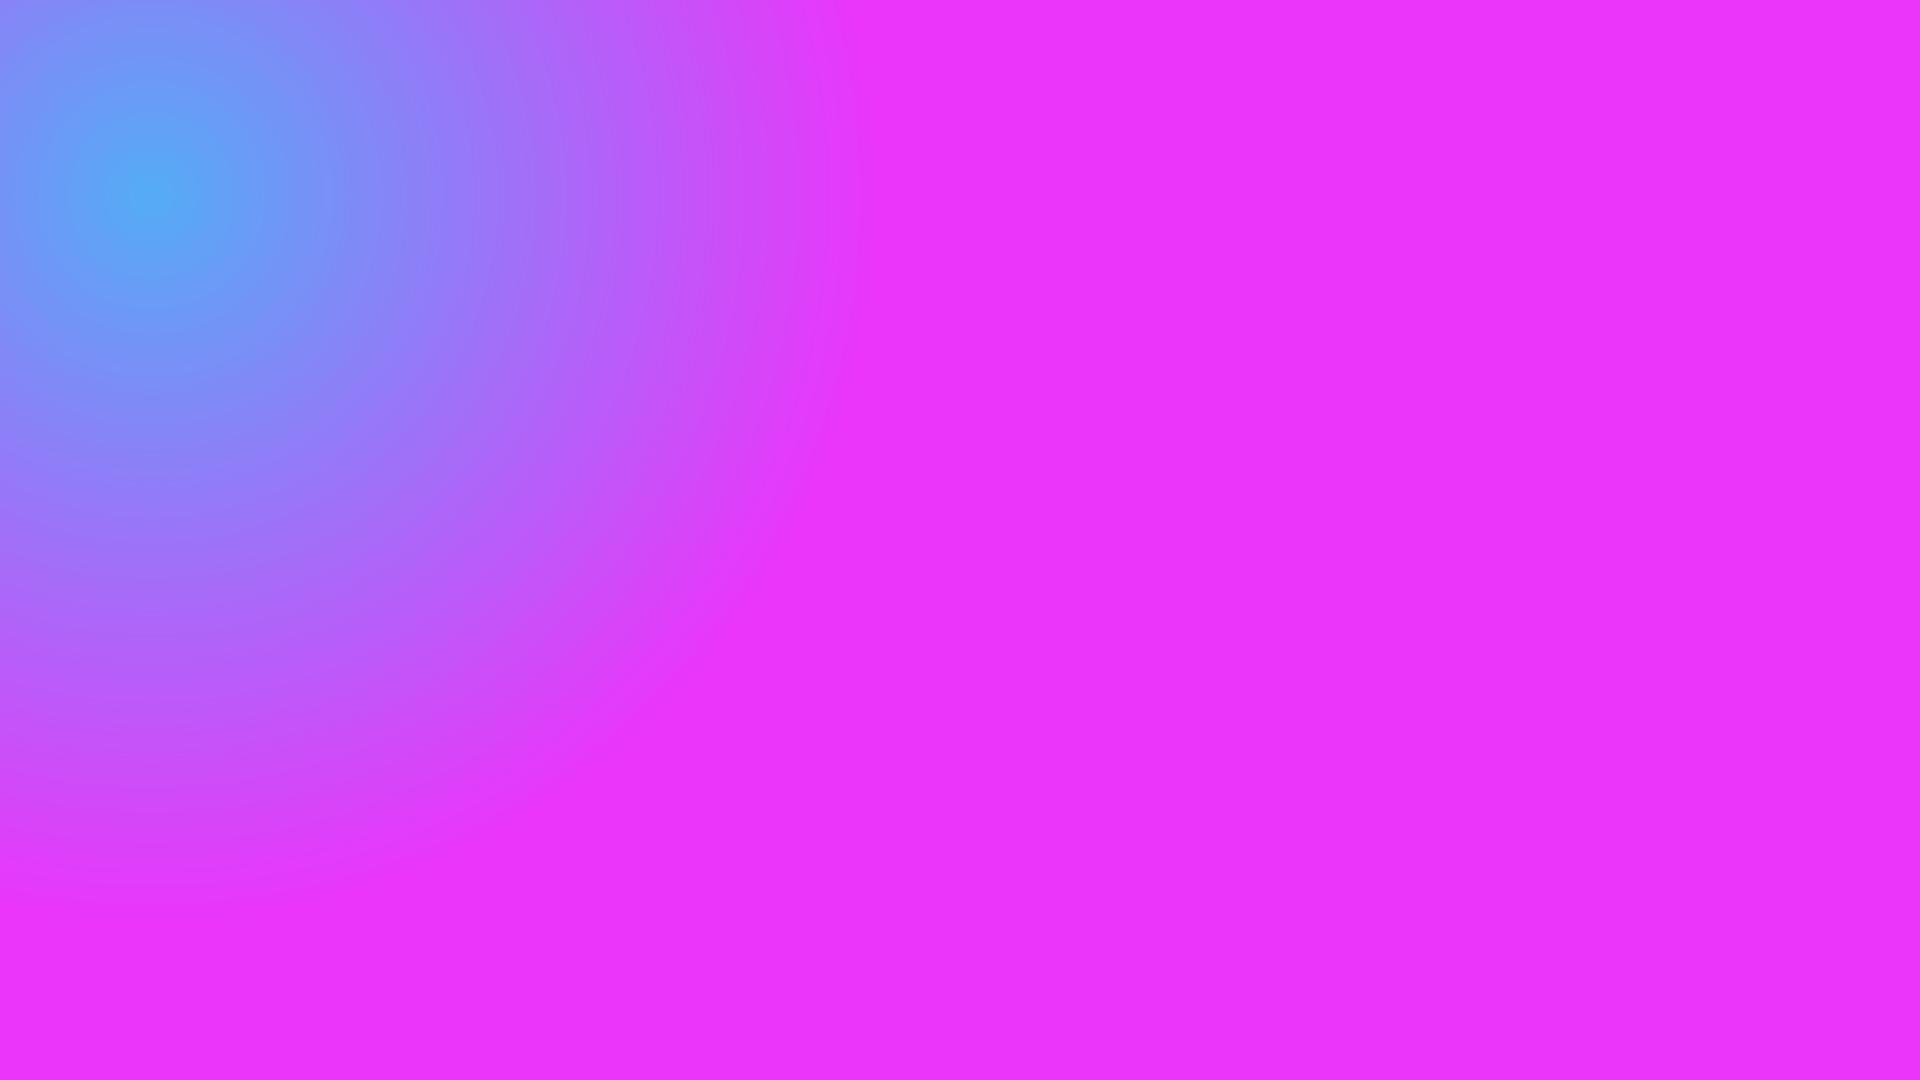 Pink/Blue Gradient